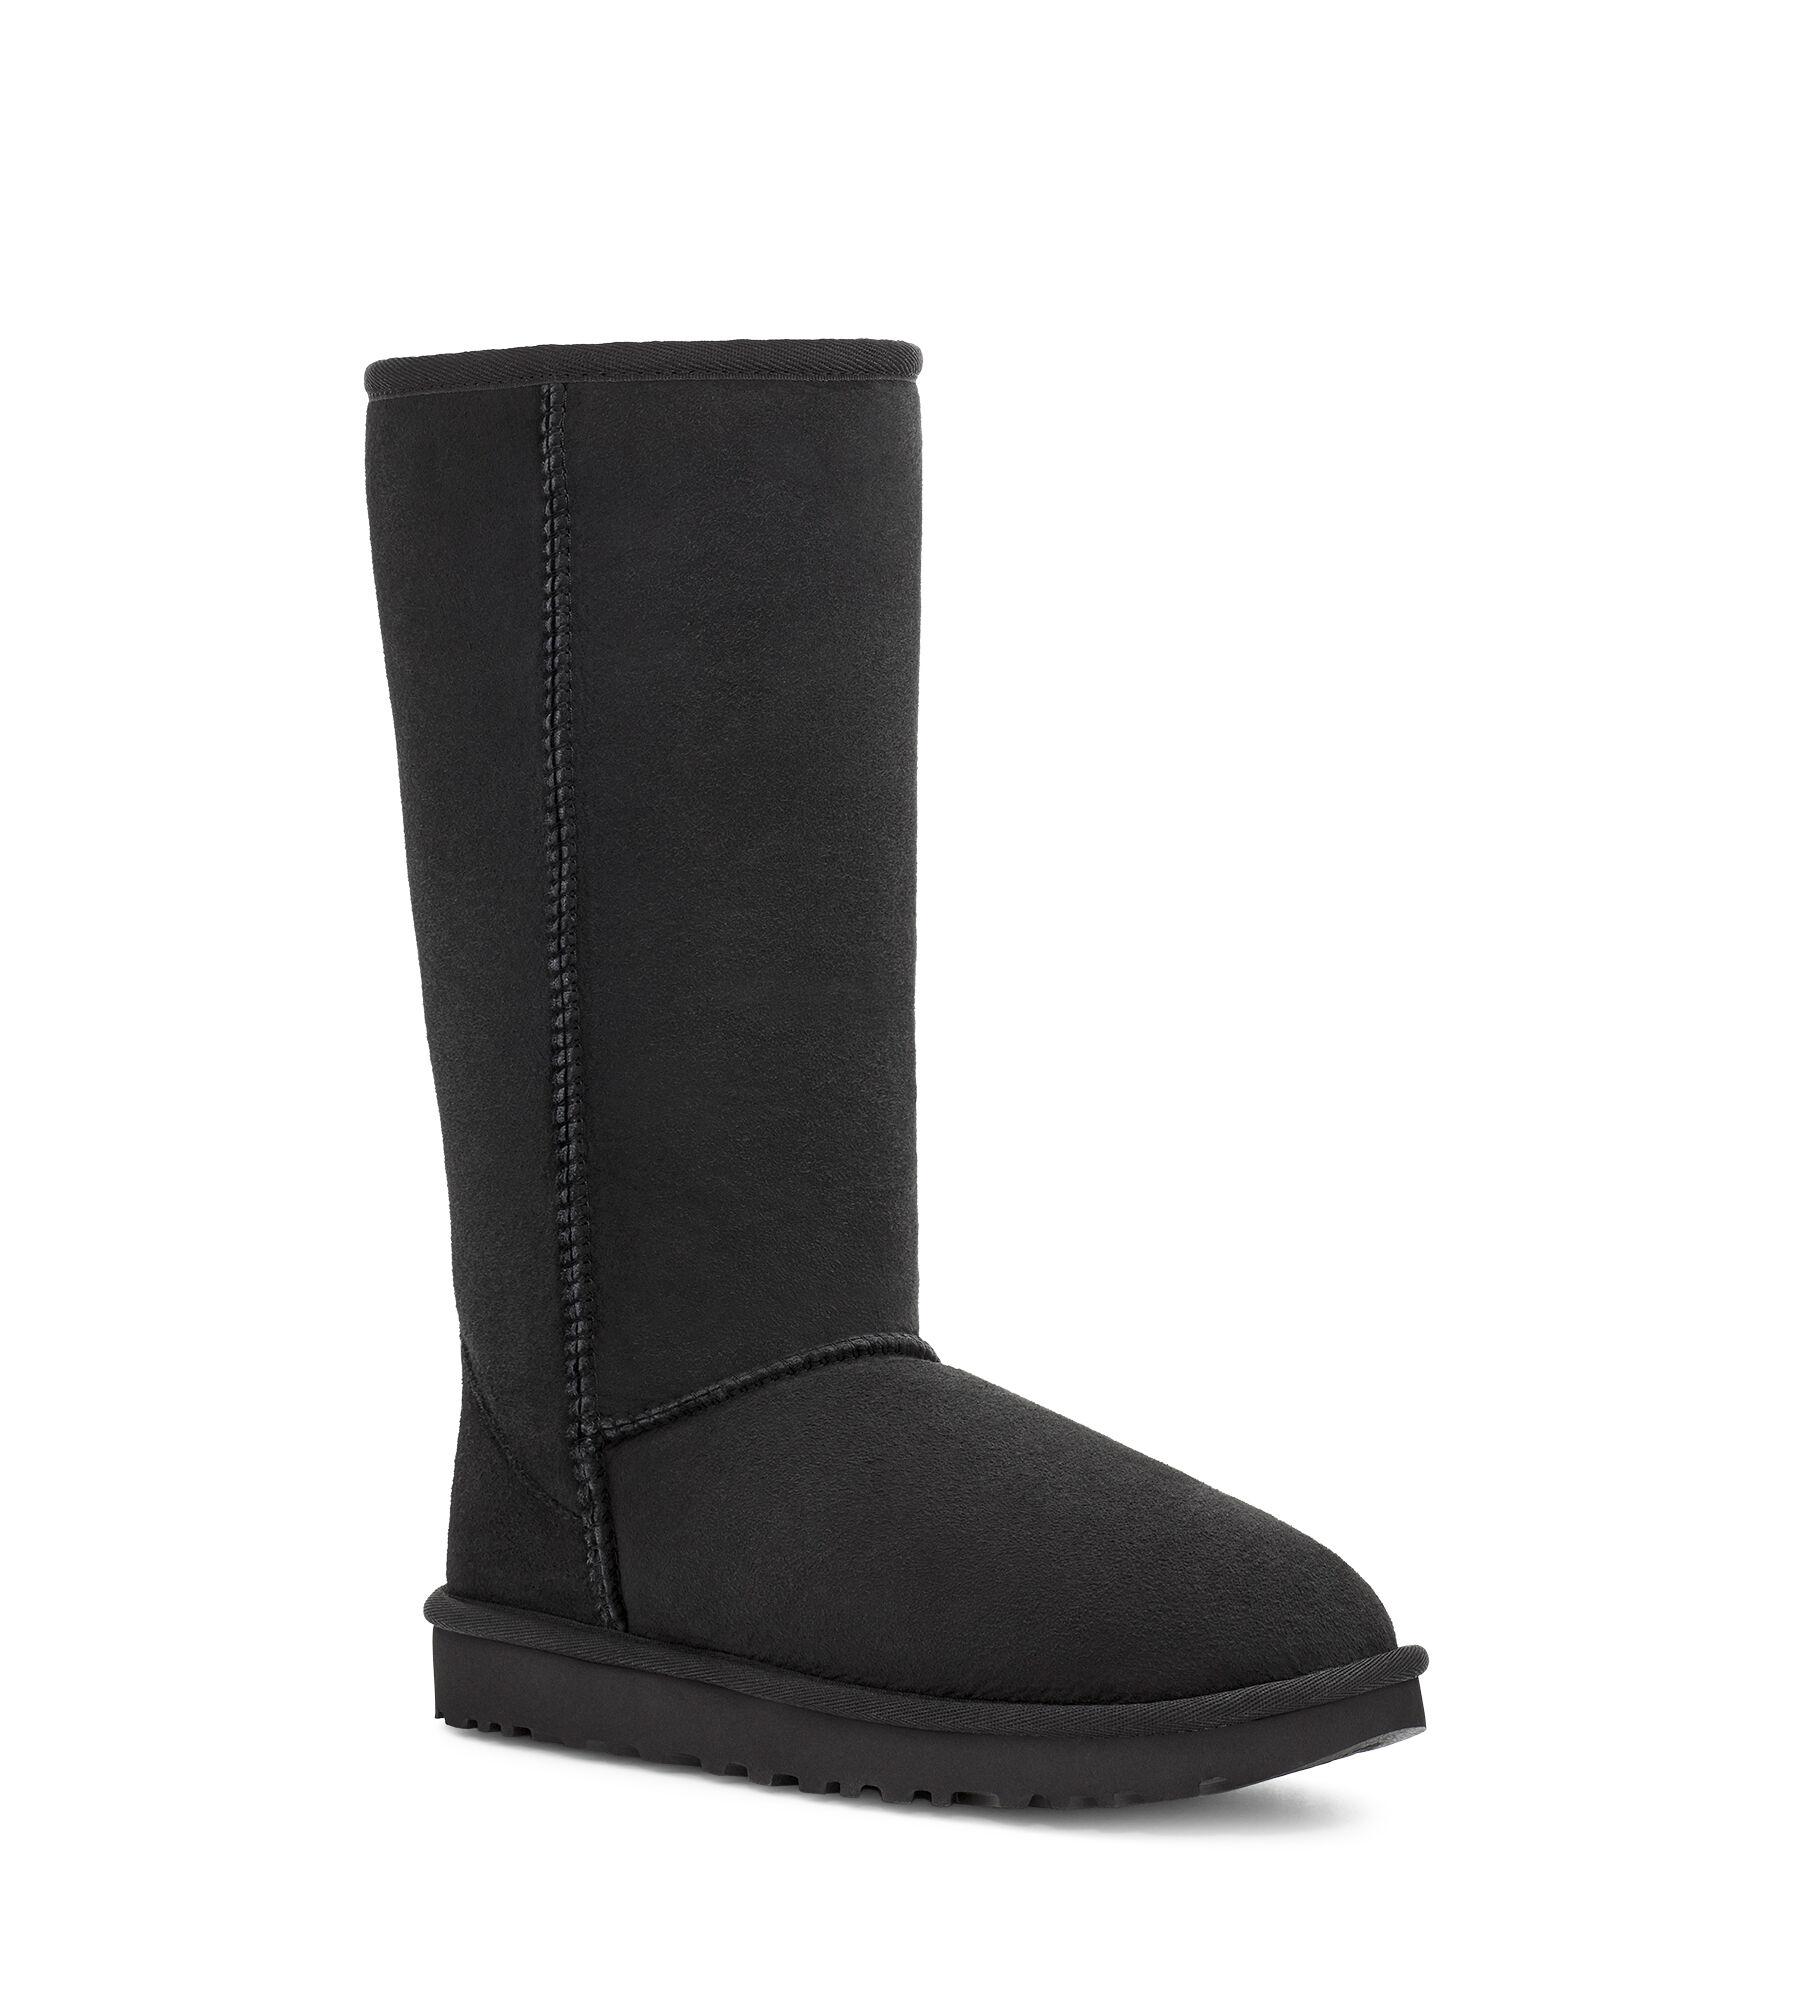 Classic Tall Sheepskin Boots   UGG